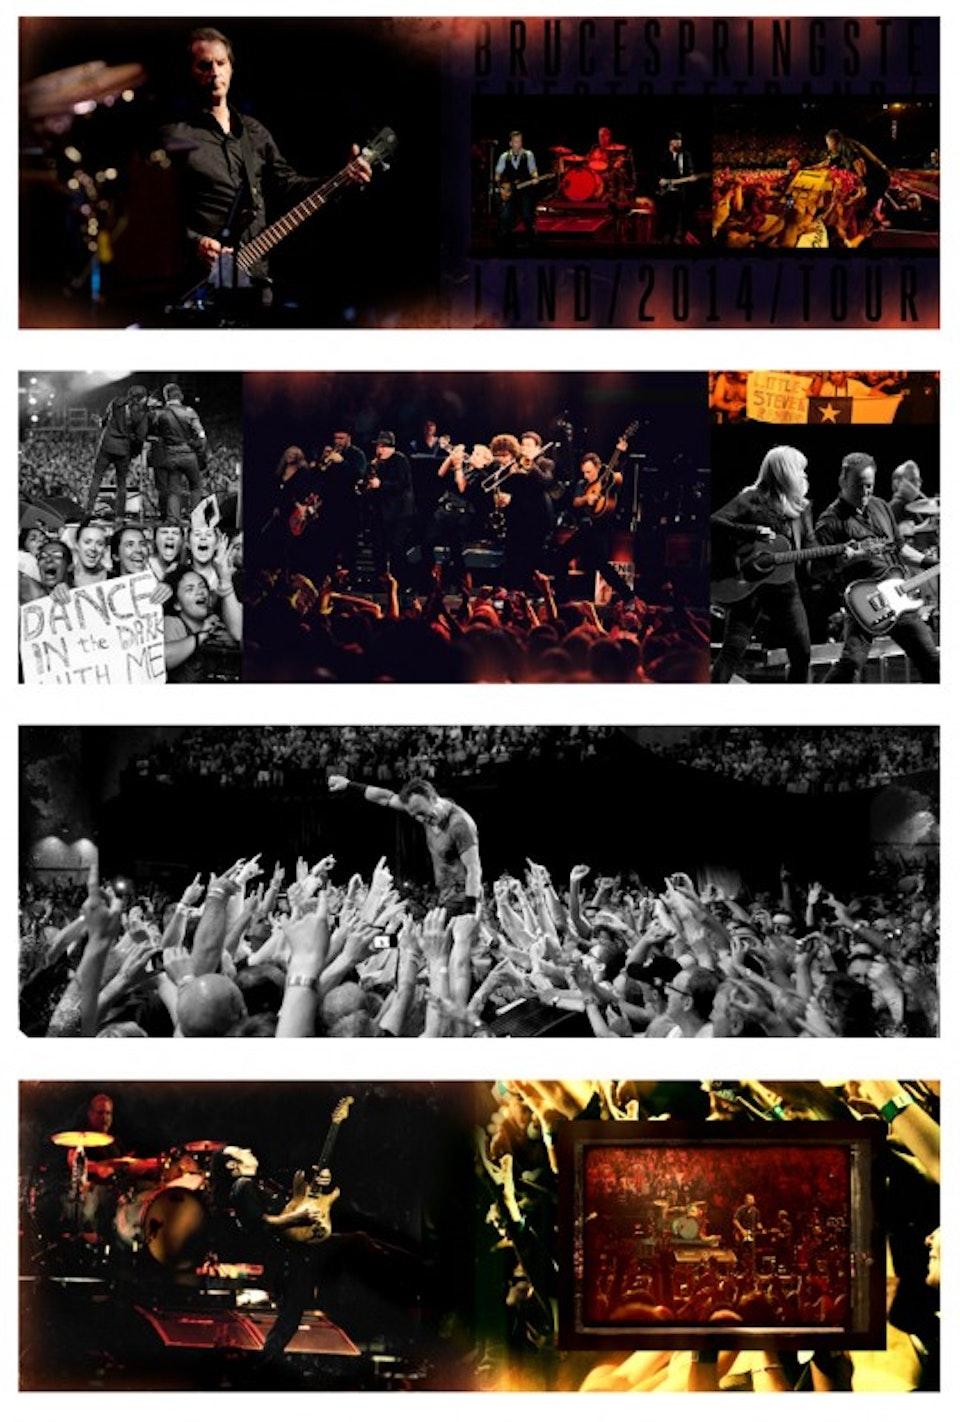 High Hope Tour Book - Tour book spreads